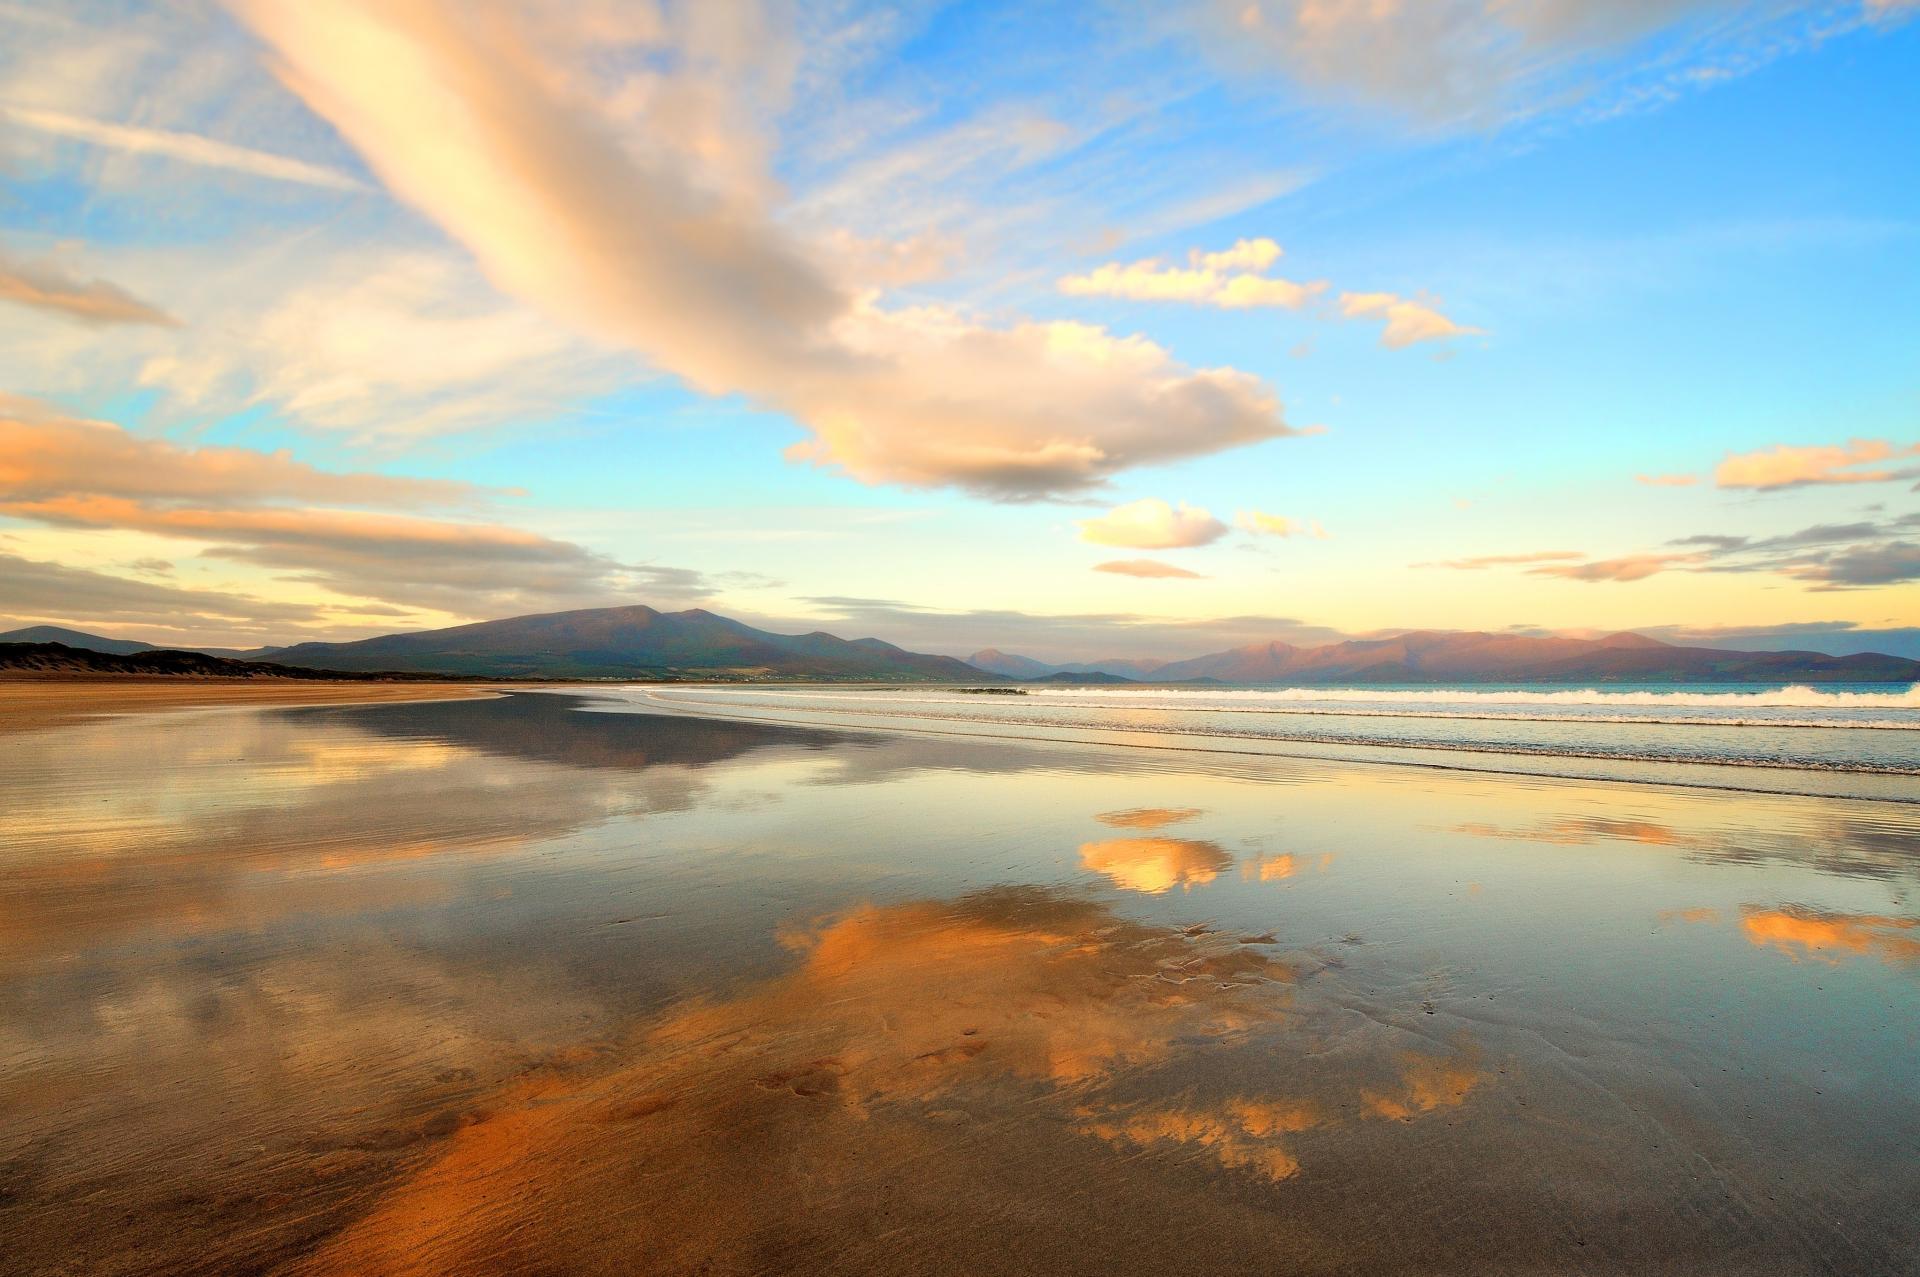 Gower Peninsular Dog Friendly Beaches